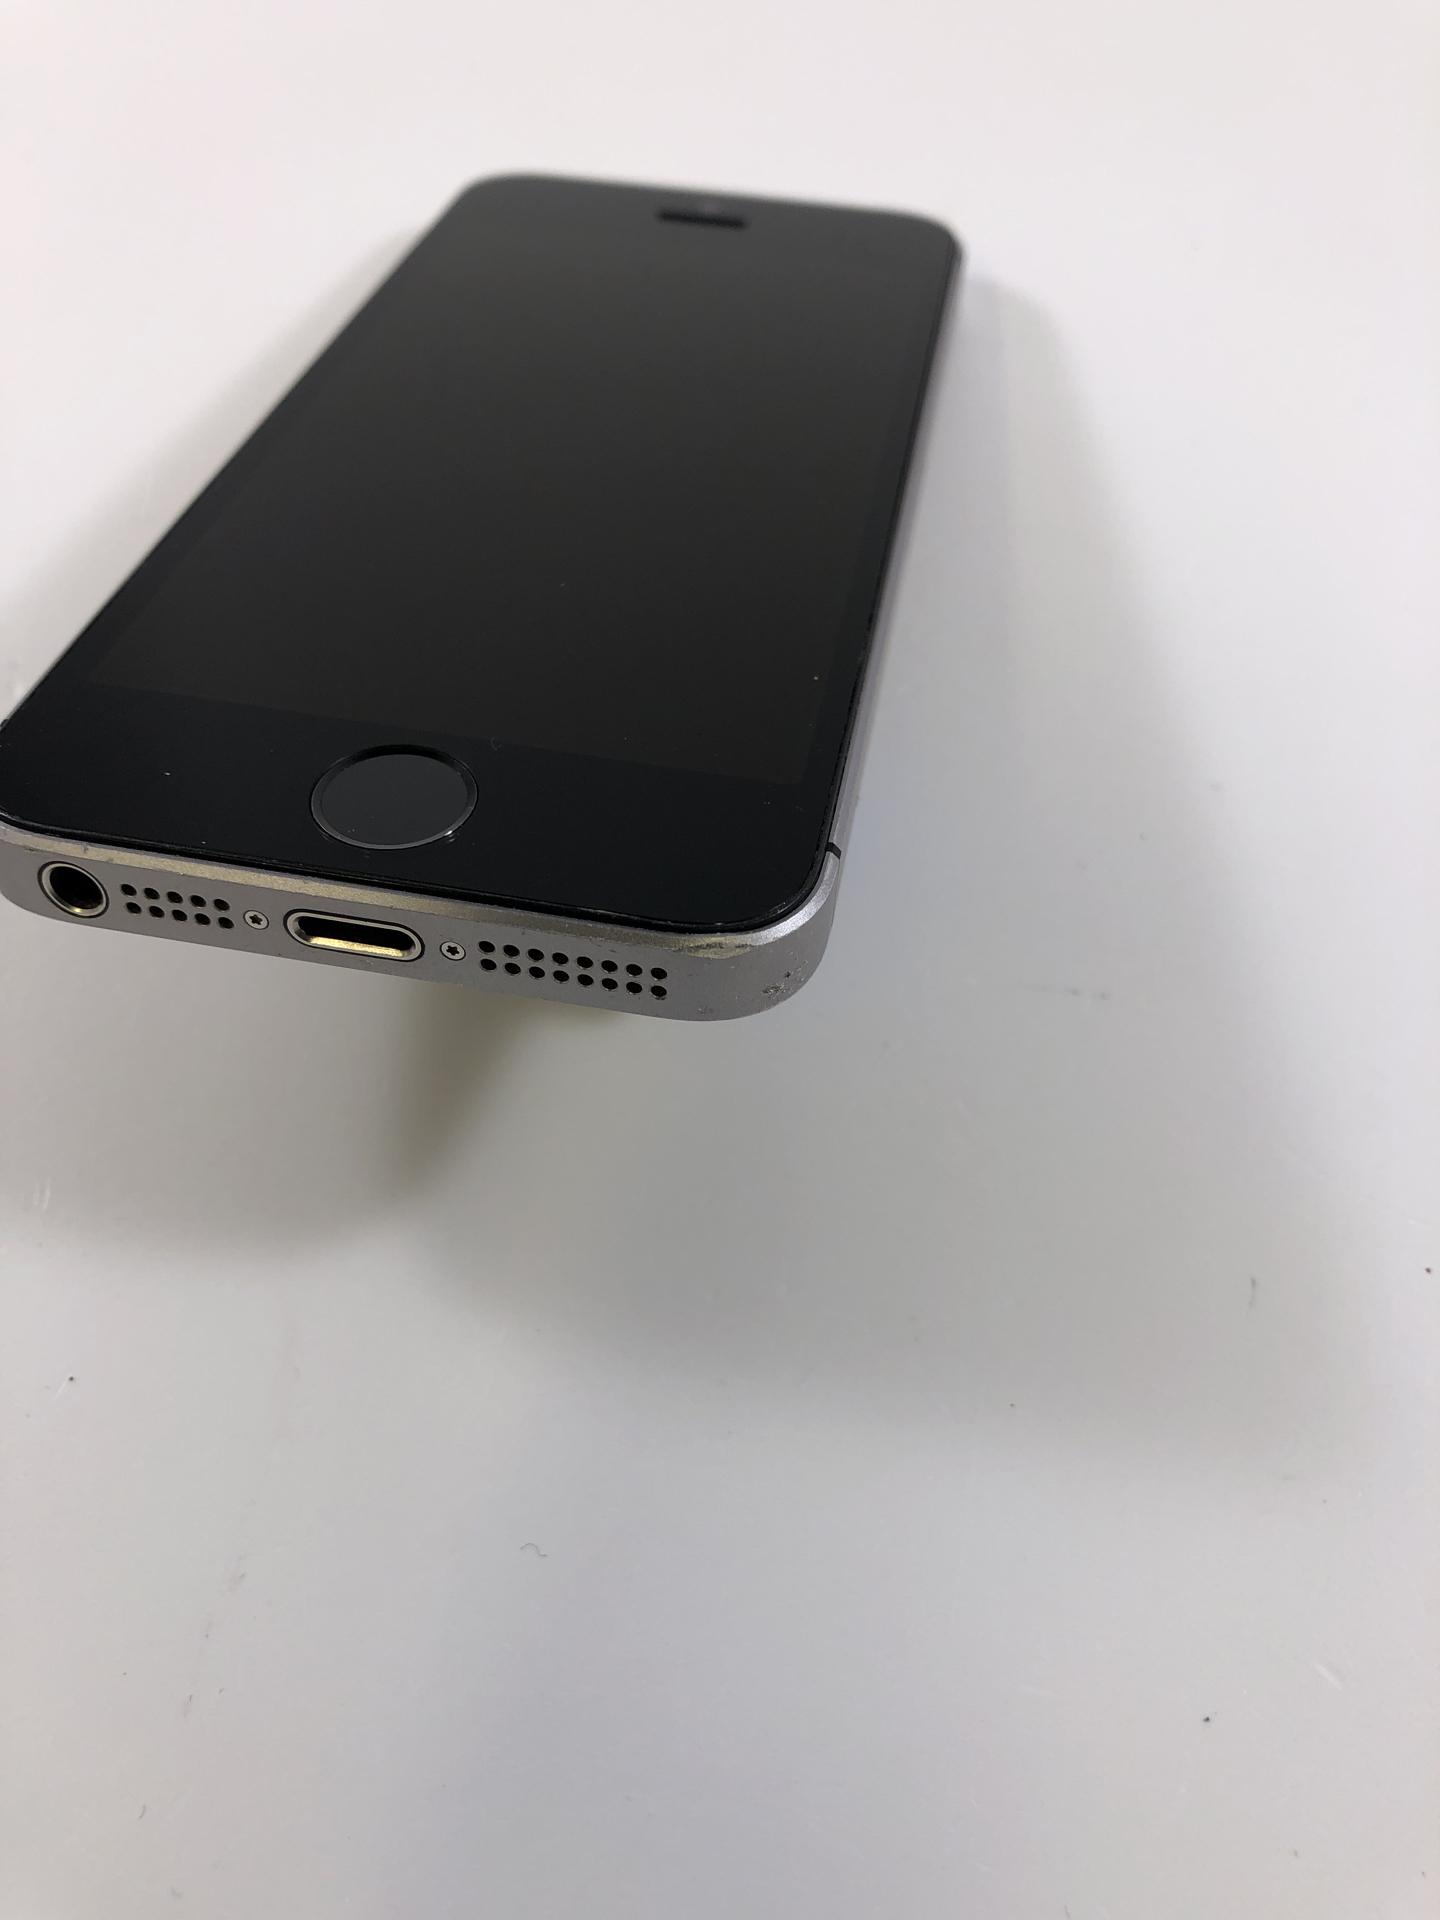 iPhone SE 16GB, 16GB, Space Gray, Bild 4